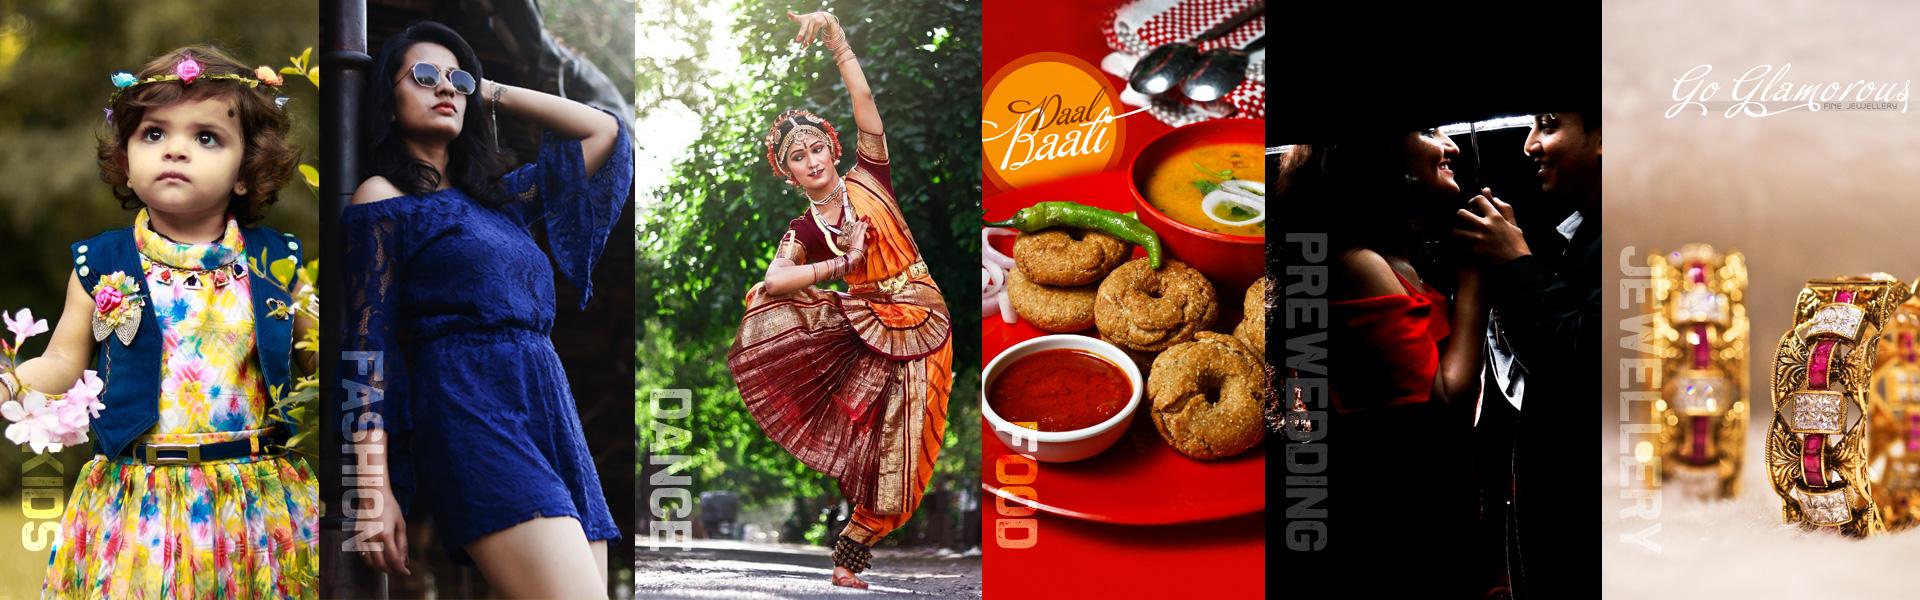 Dip Memento Photography Pre Wedding , Weddings, Product/Food, Family , Couple Portraits , Kids Portfolios , Fashion , Modelling portfolios.